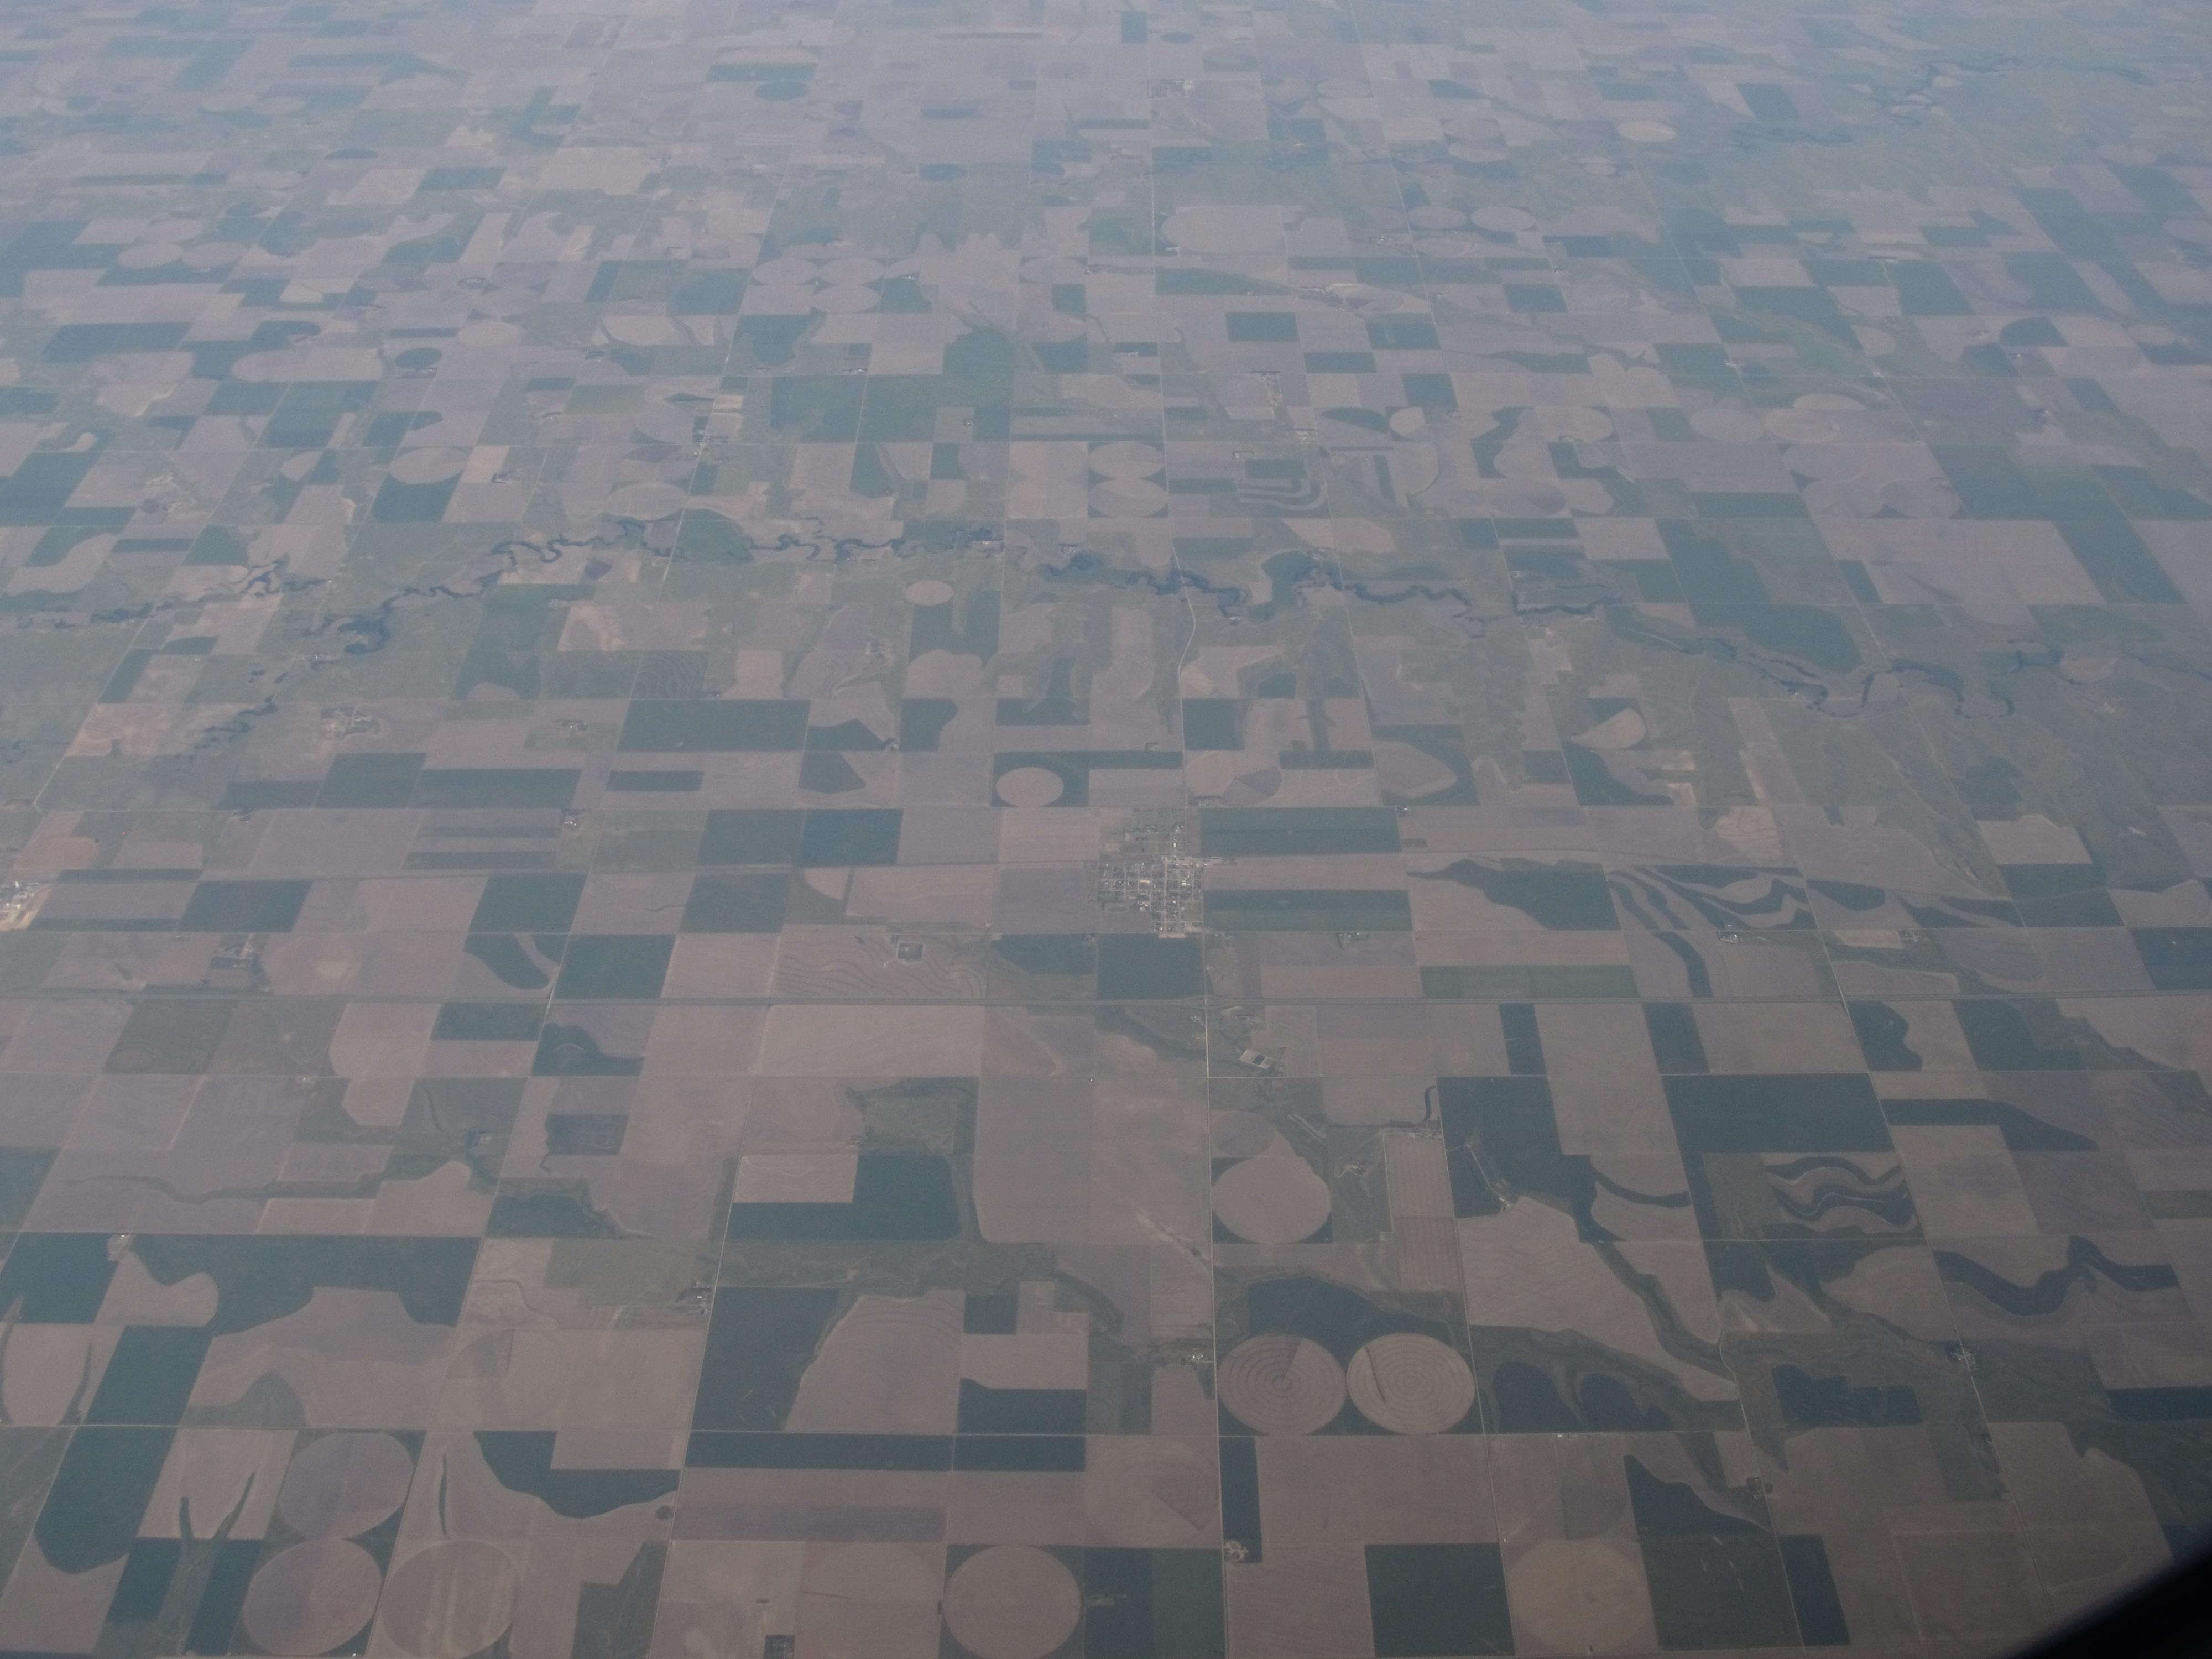 Kansas gove county grinnell - File Grinnell Kansas 7235140692 Jpg